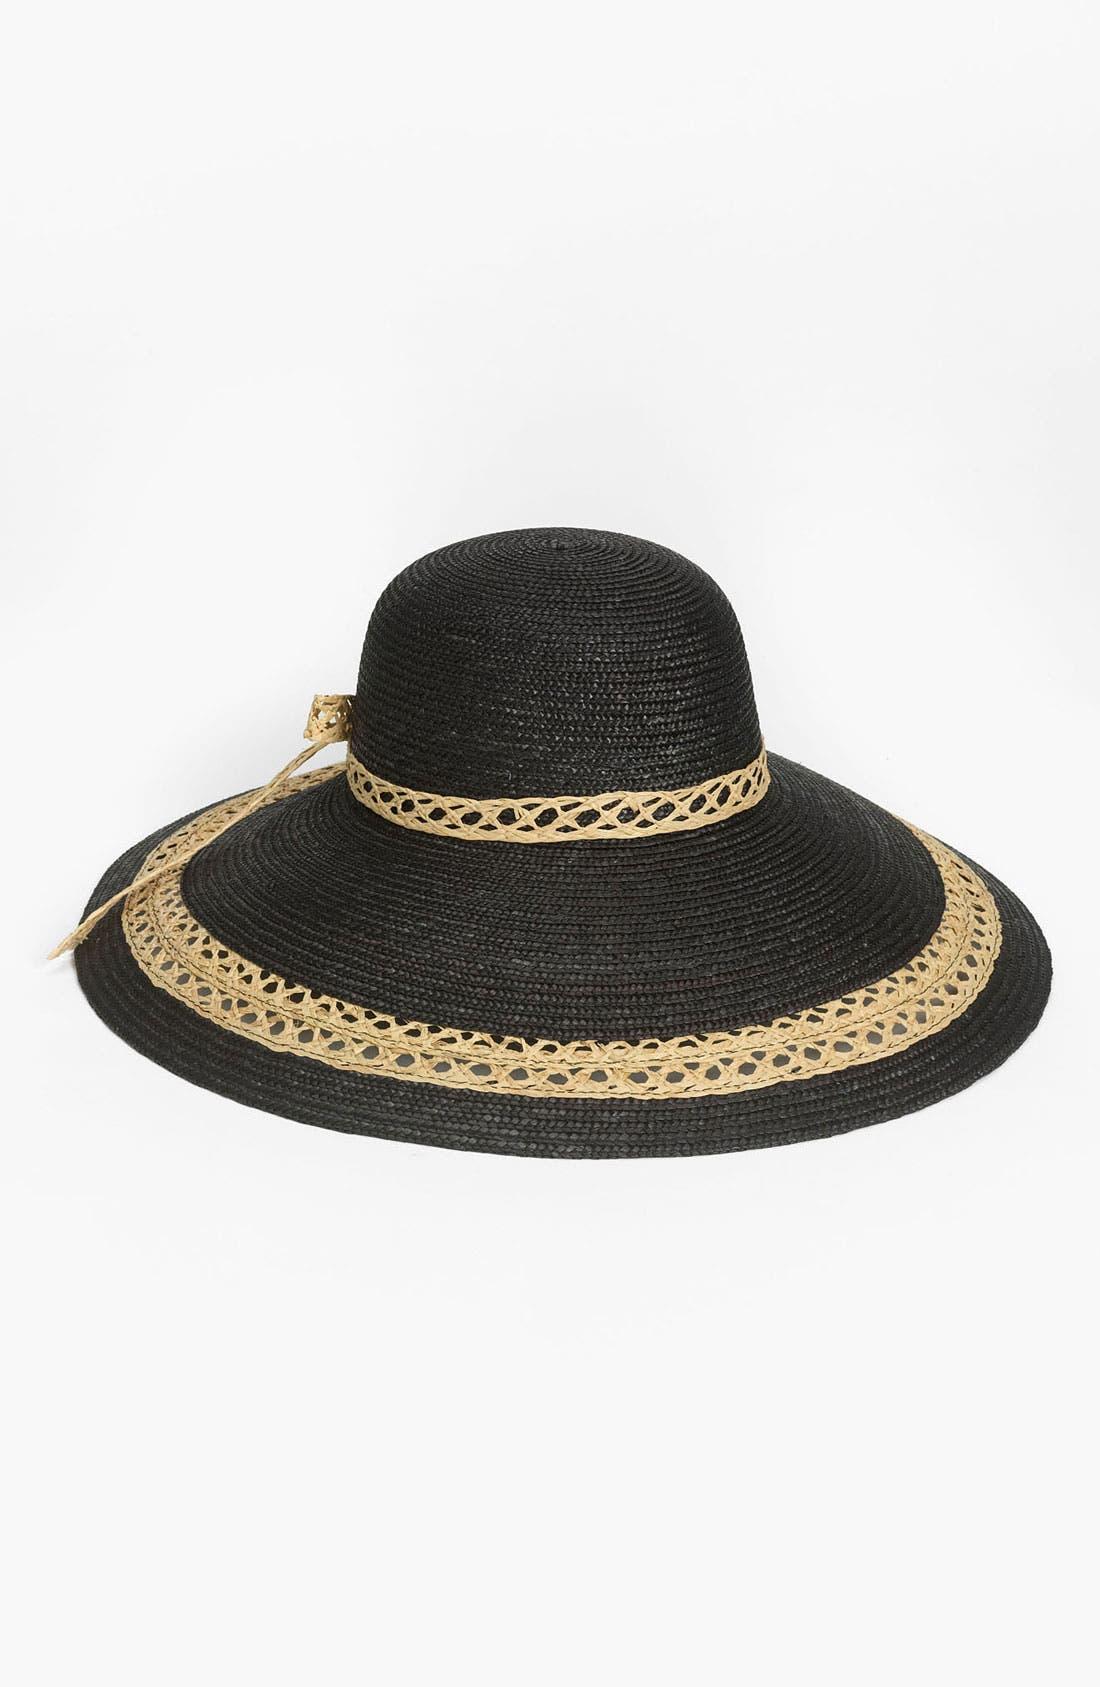 Alternate Image 1 Selected - Nordstrom Wide Brim Sun Hat